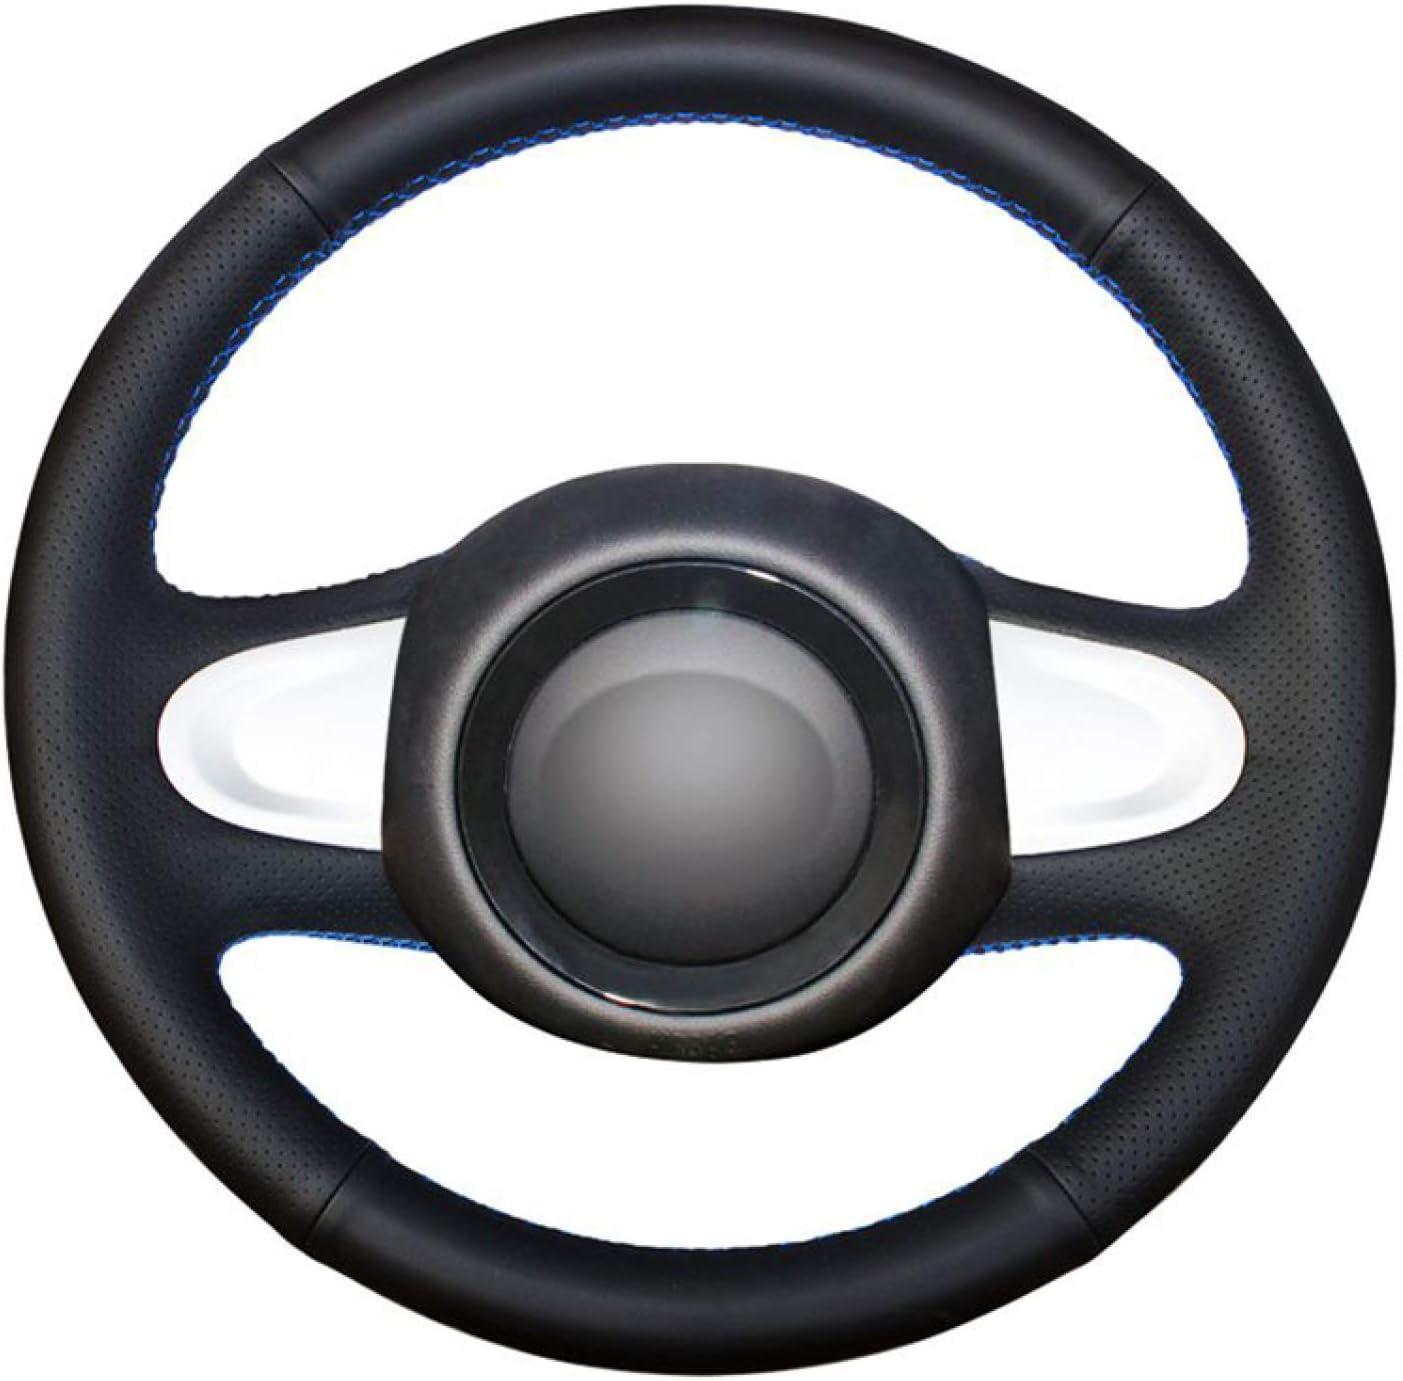 CarWorld para Mini Coupe 2013 (2 radios), Fundas de Volante de Cuero Artificial PU Negro, Funda de Volante de Coche Cosida a Mano